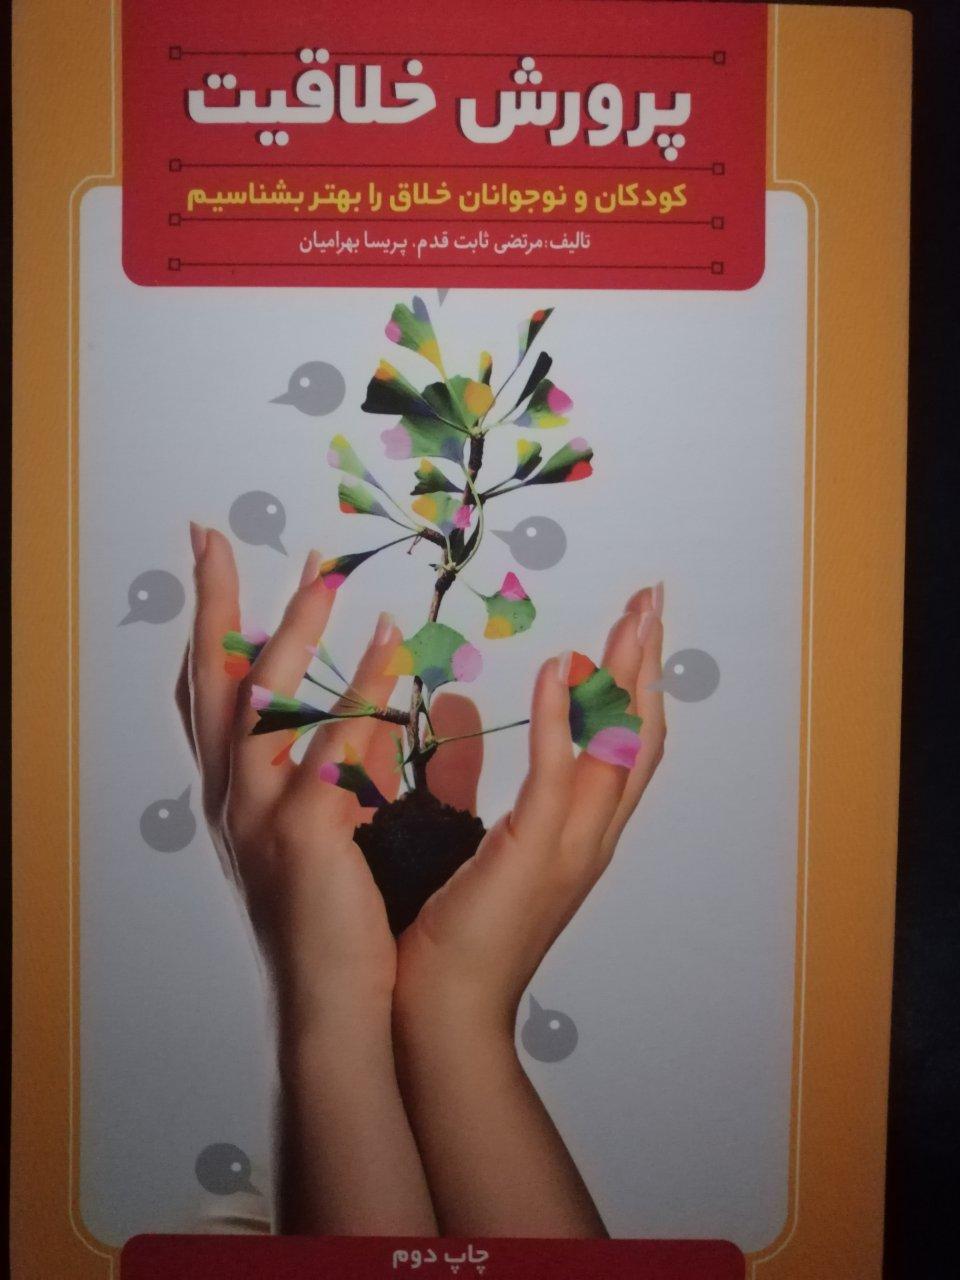 کتاب الکترونیکی پرورش خلاقیت اثر مرتضی ثابت قدم،پریسا بهرامیان